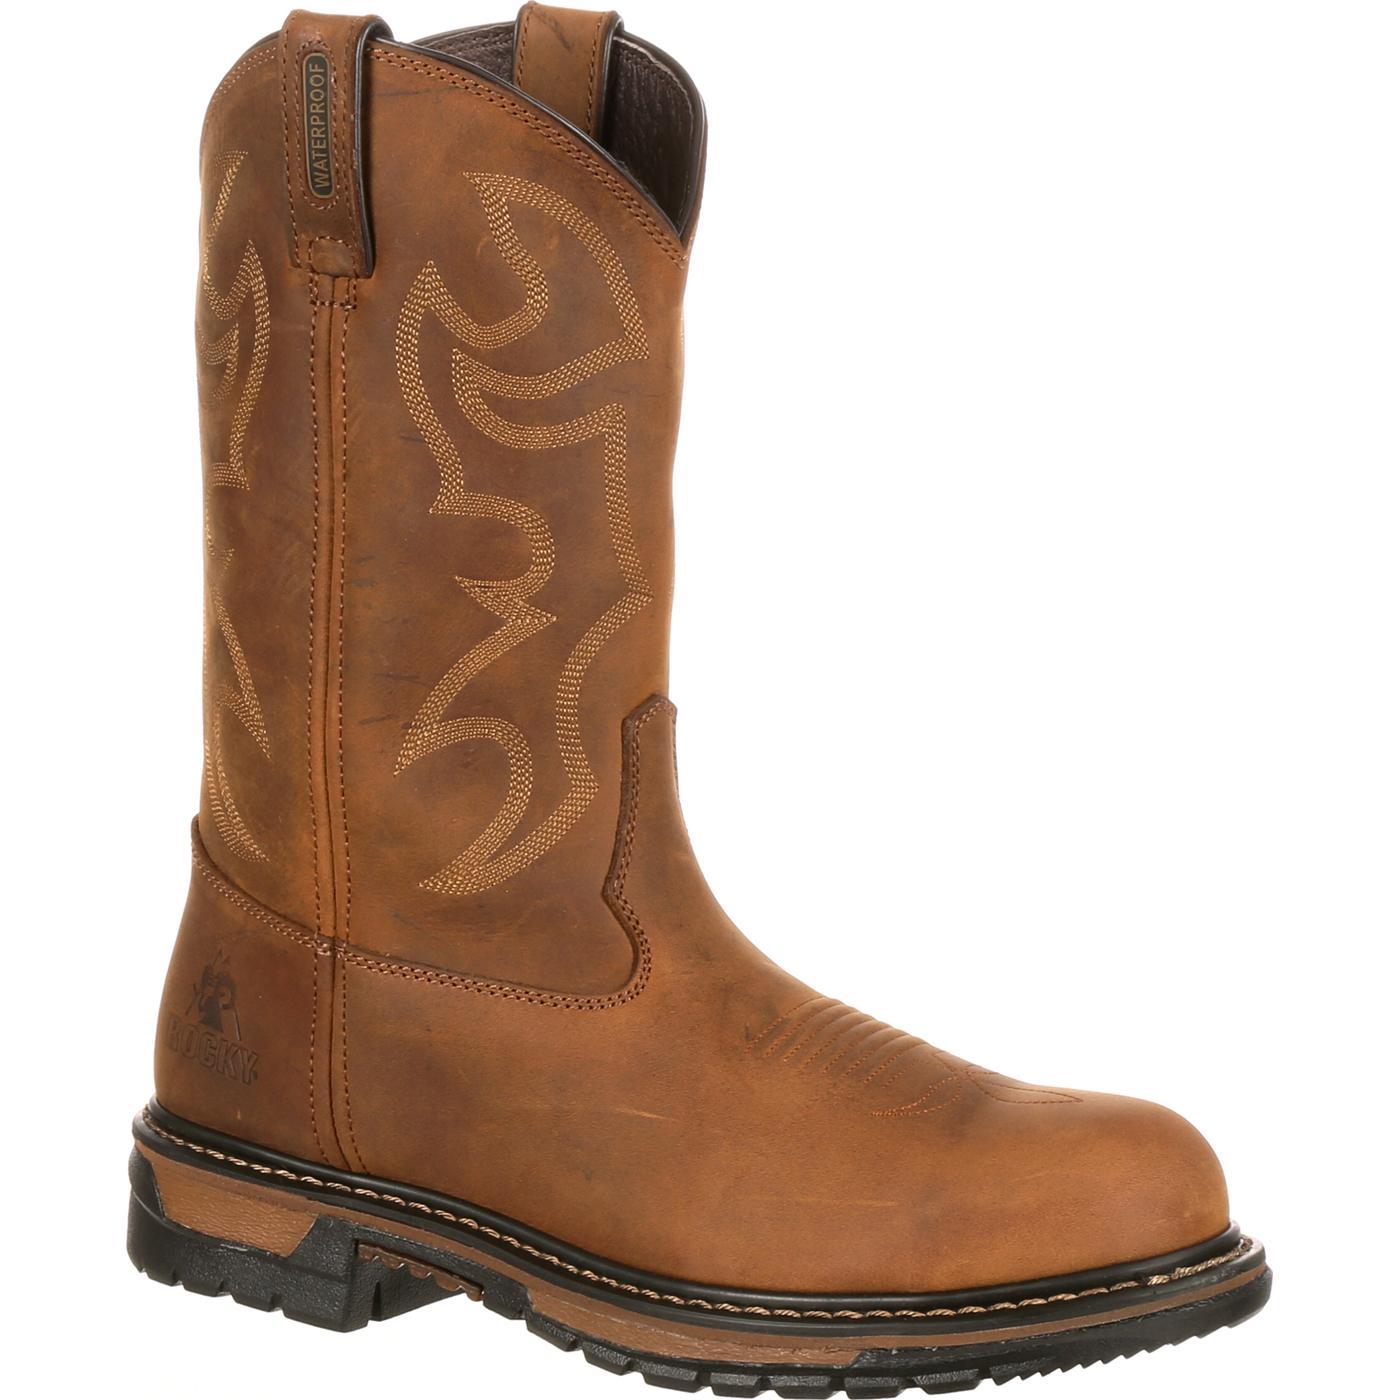 Men's Waterproof Steel Toe Western Boot, Rocky Original Ride